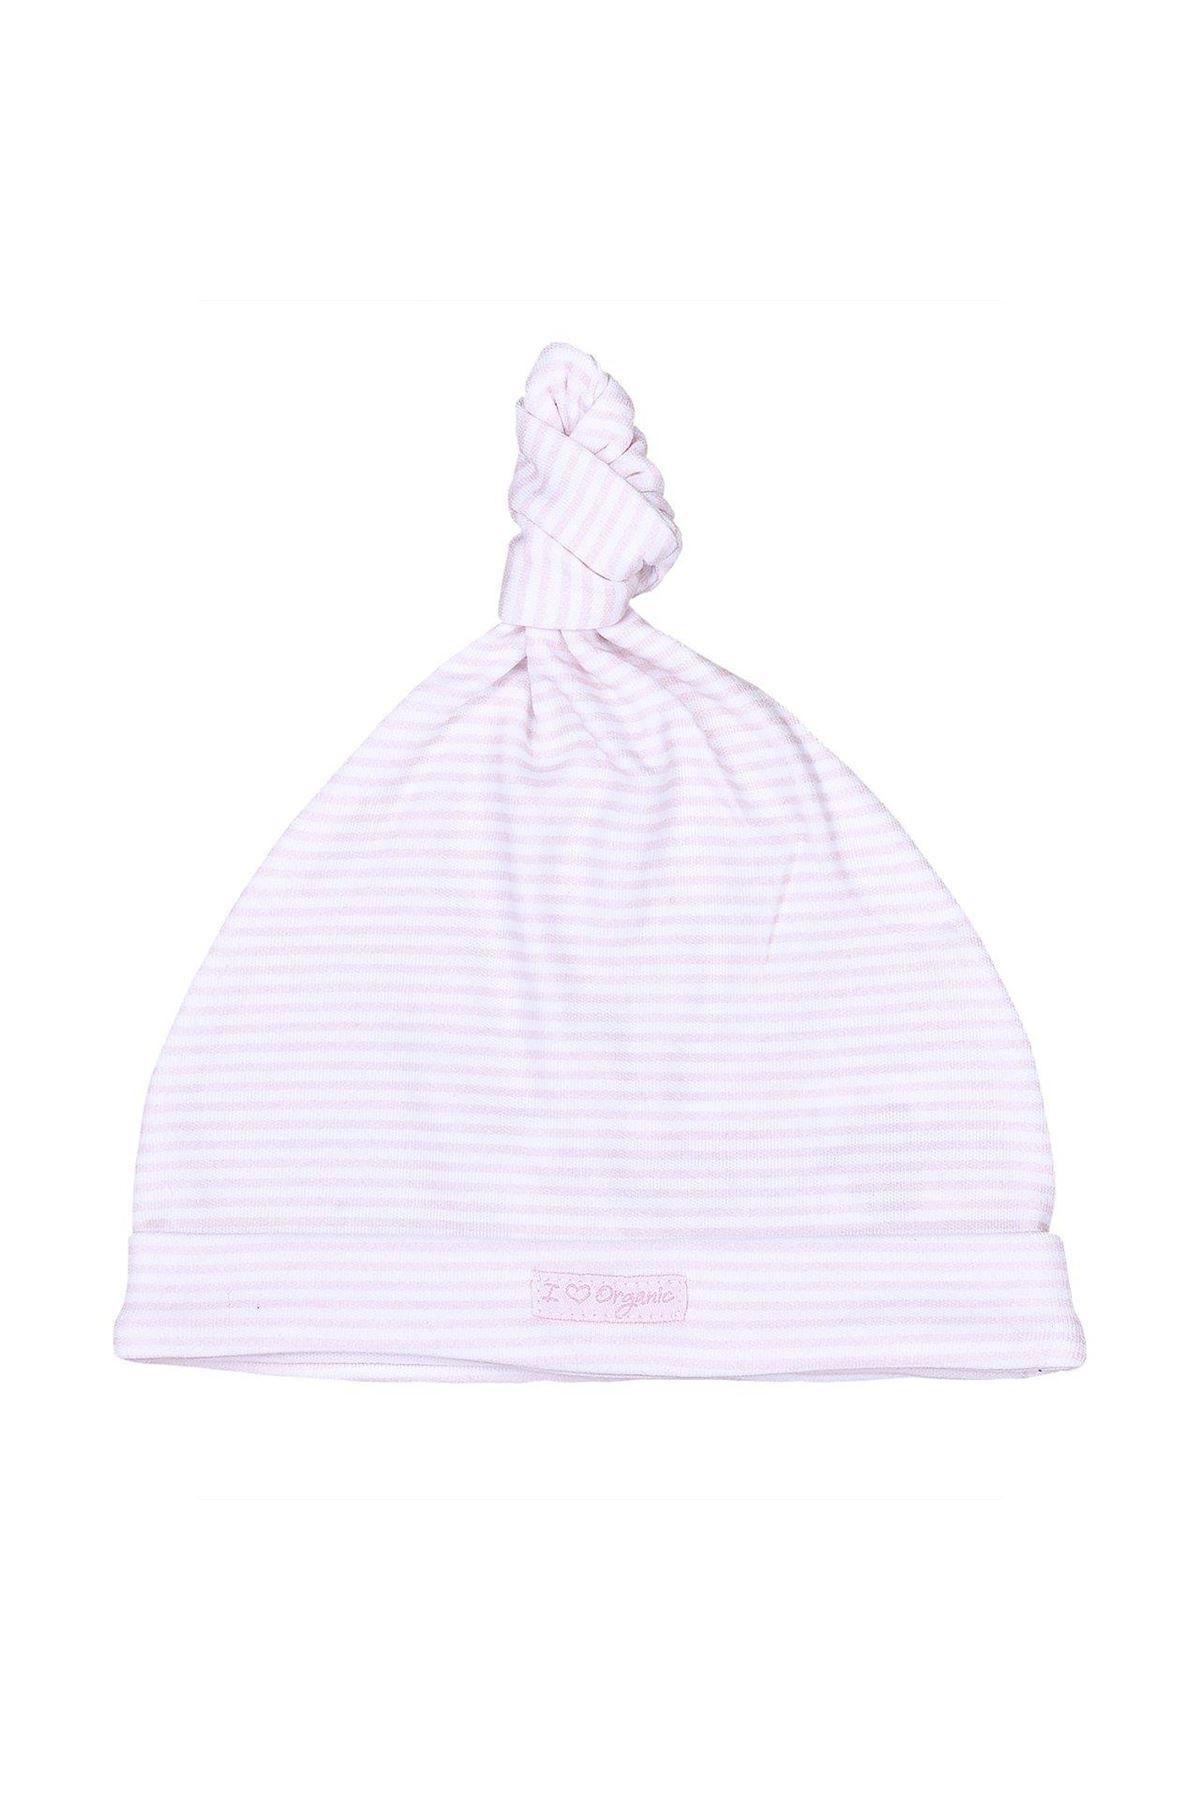 KitiKate Organik Dreams Bağlamalı Şapka 15928 Pembe Çizgili